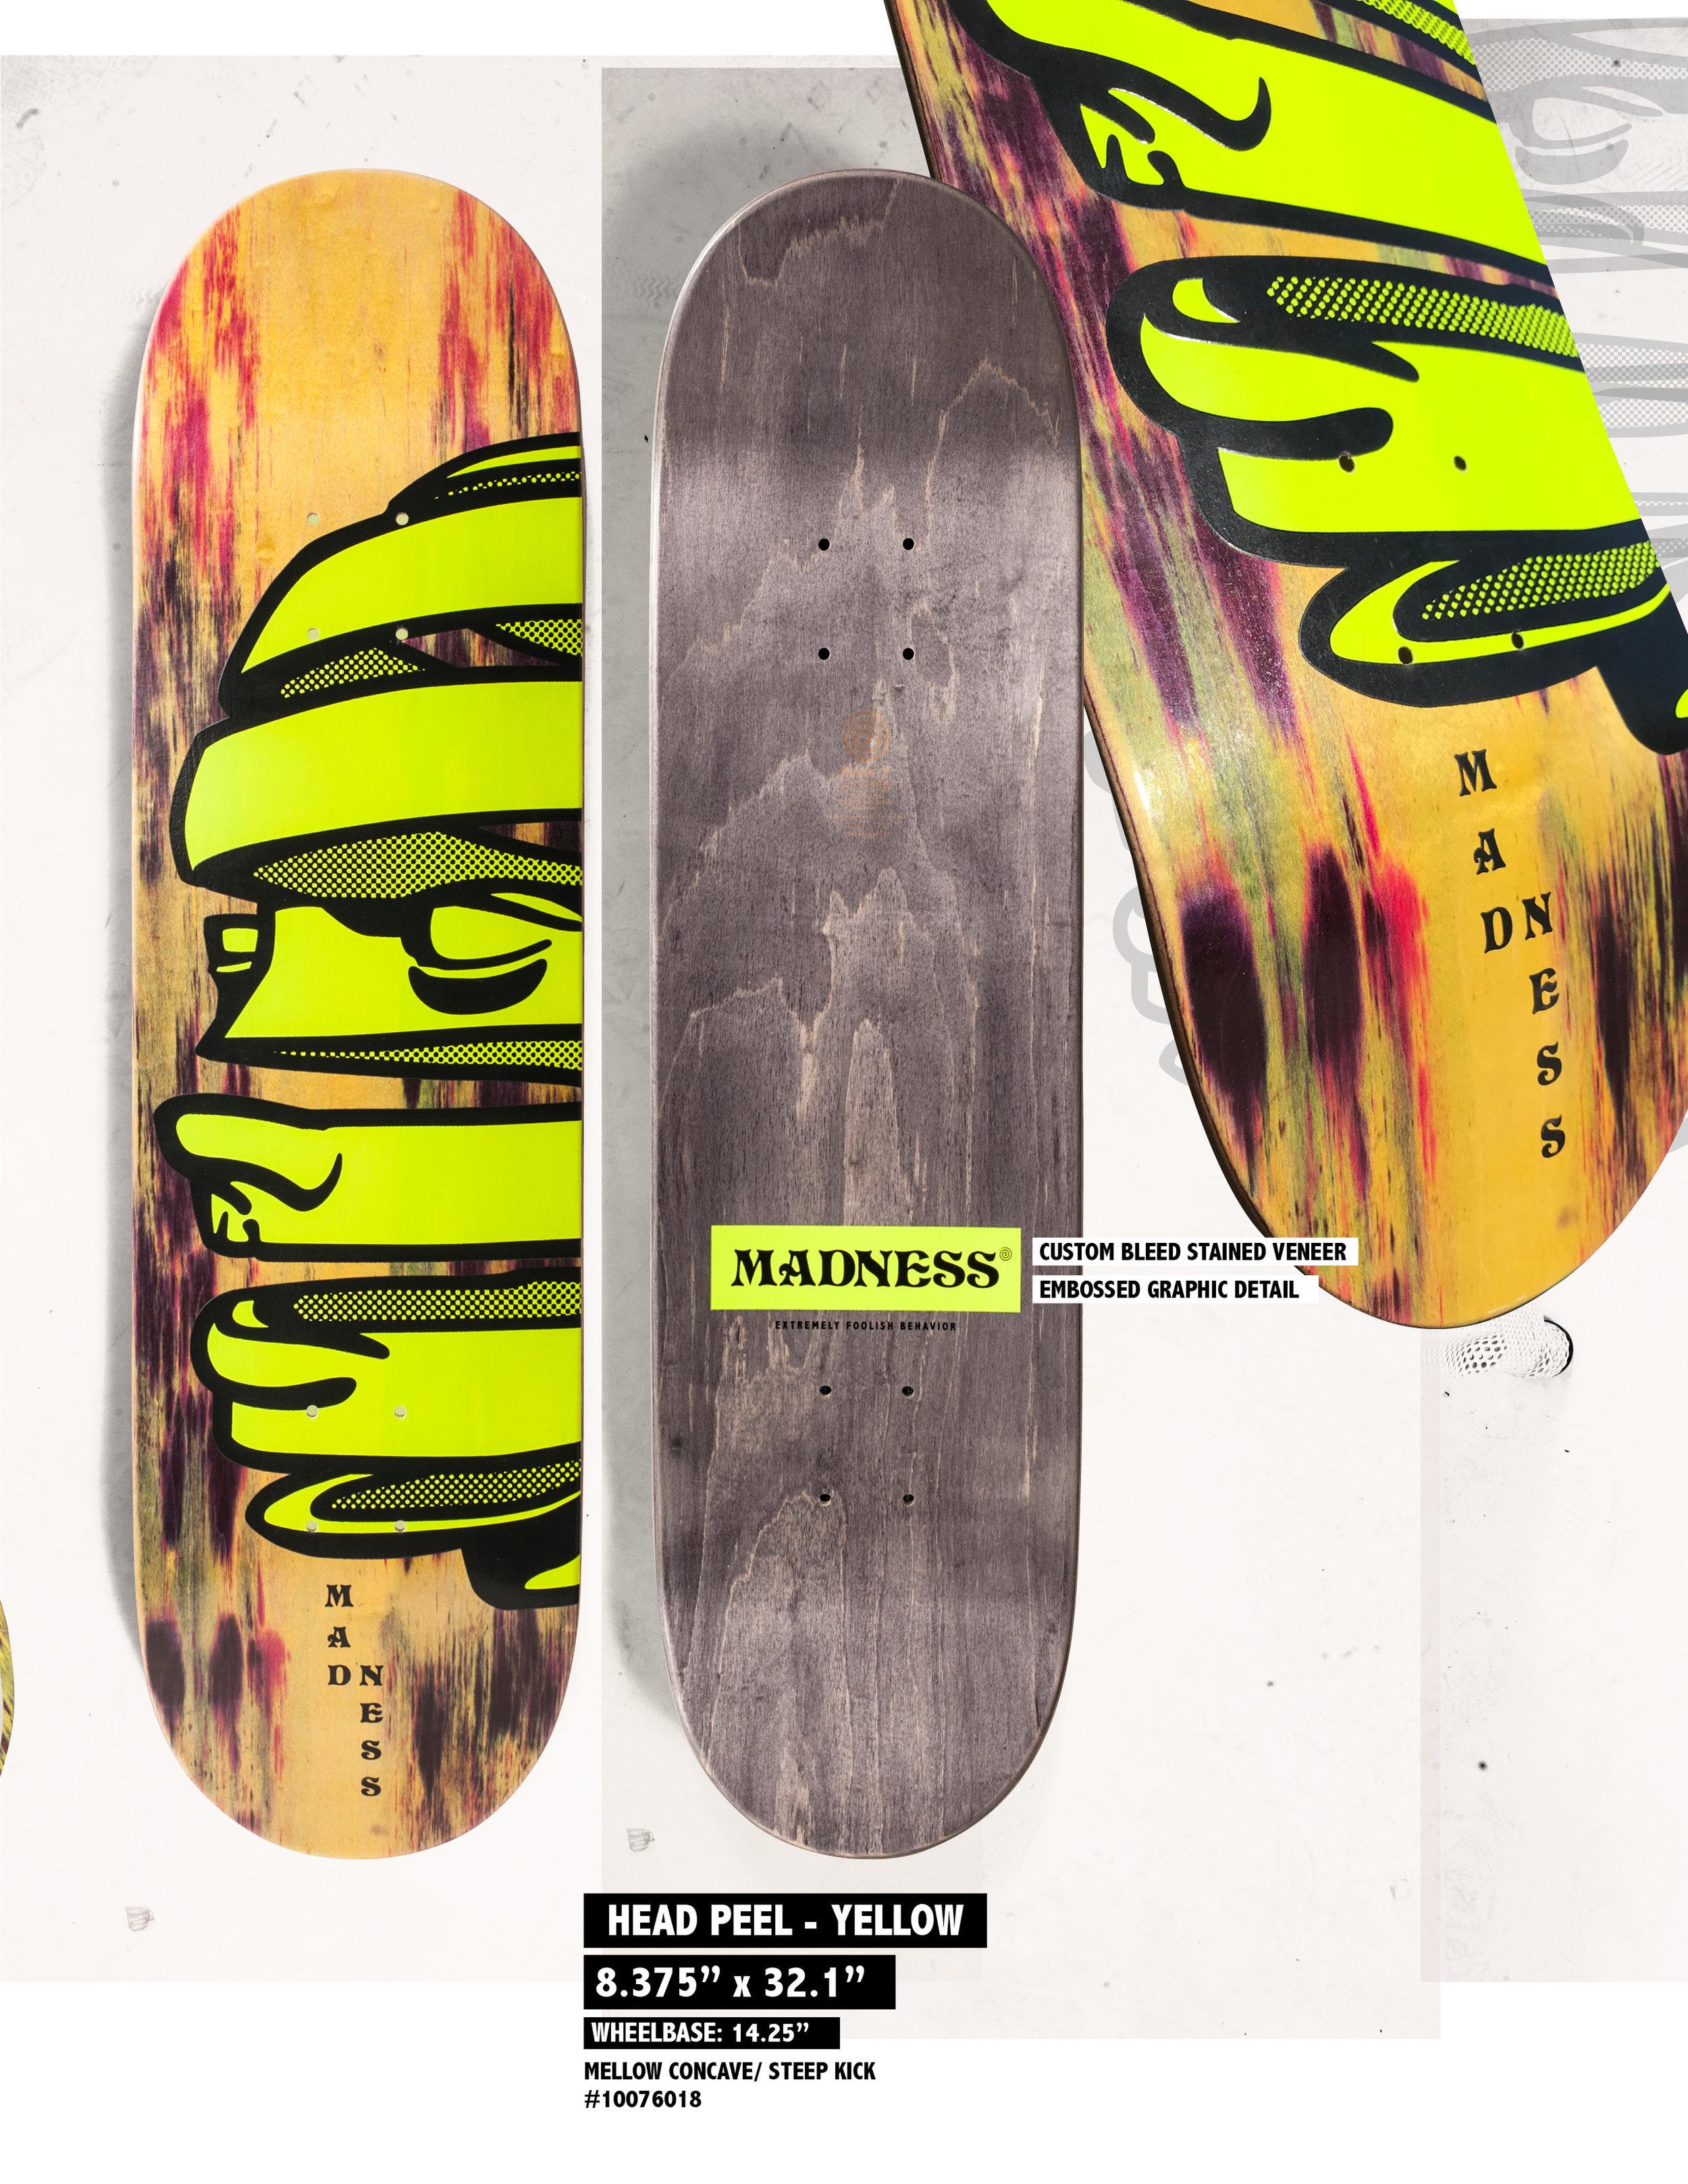 Madness_Spring_1919_Head_Peel_Skateboard_Deck.jpg